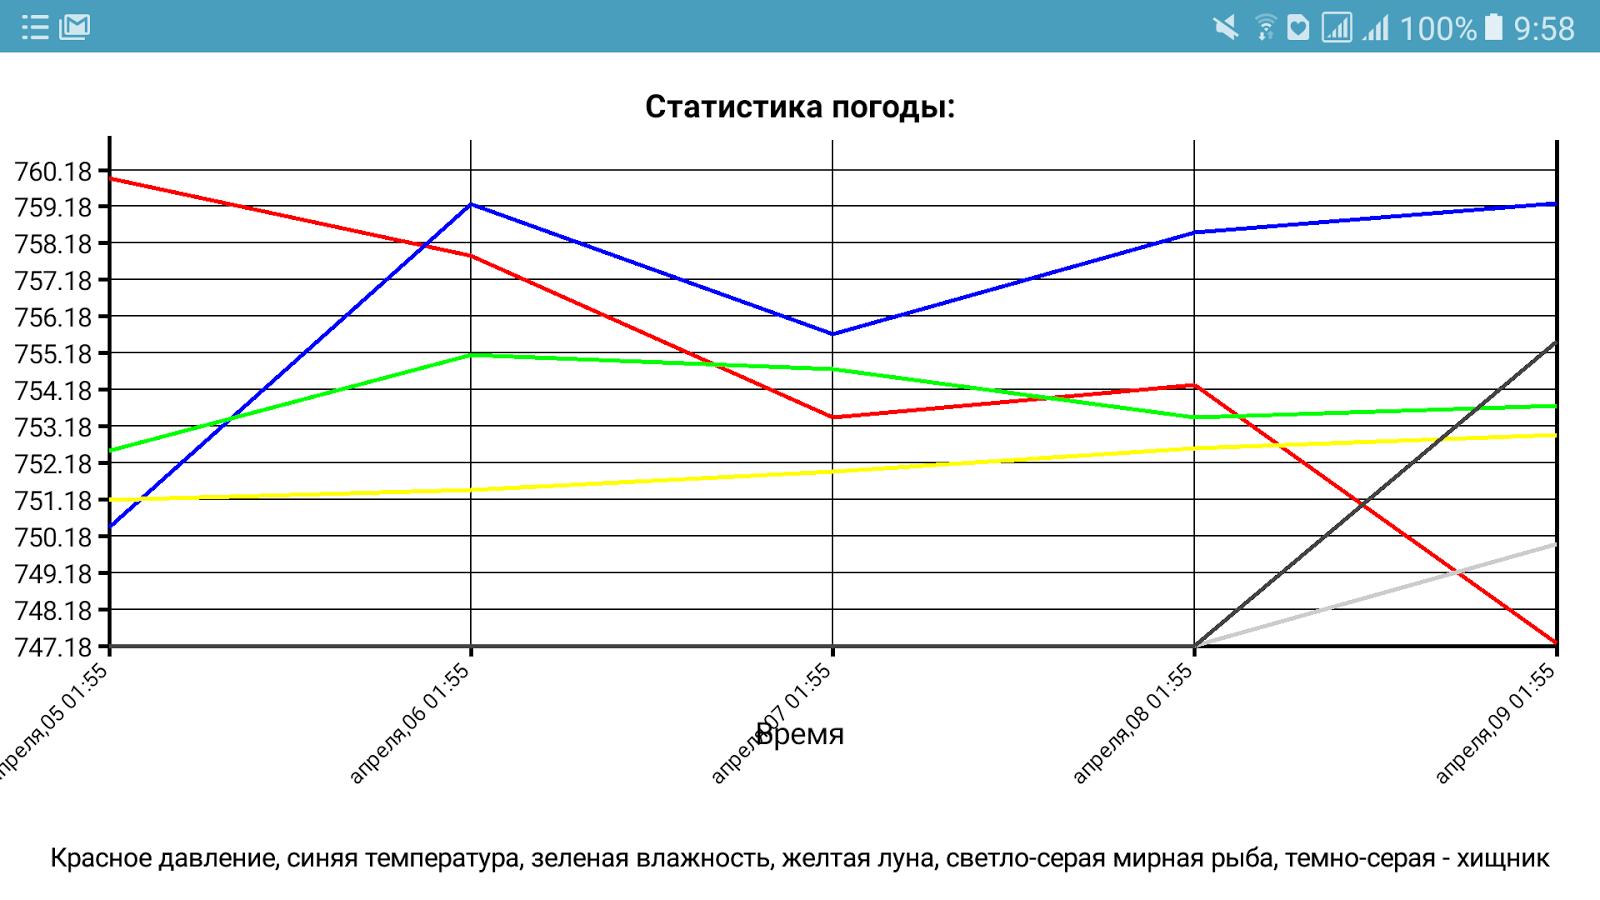 прогноз клёва толстолобика в белгороде